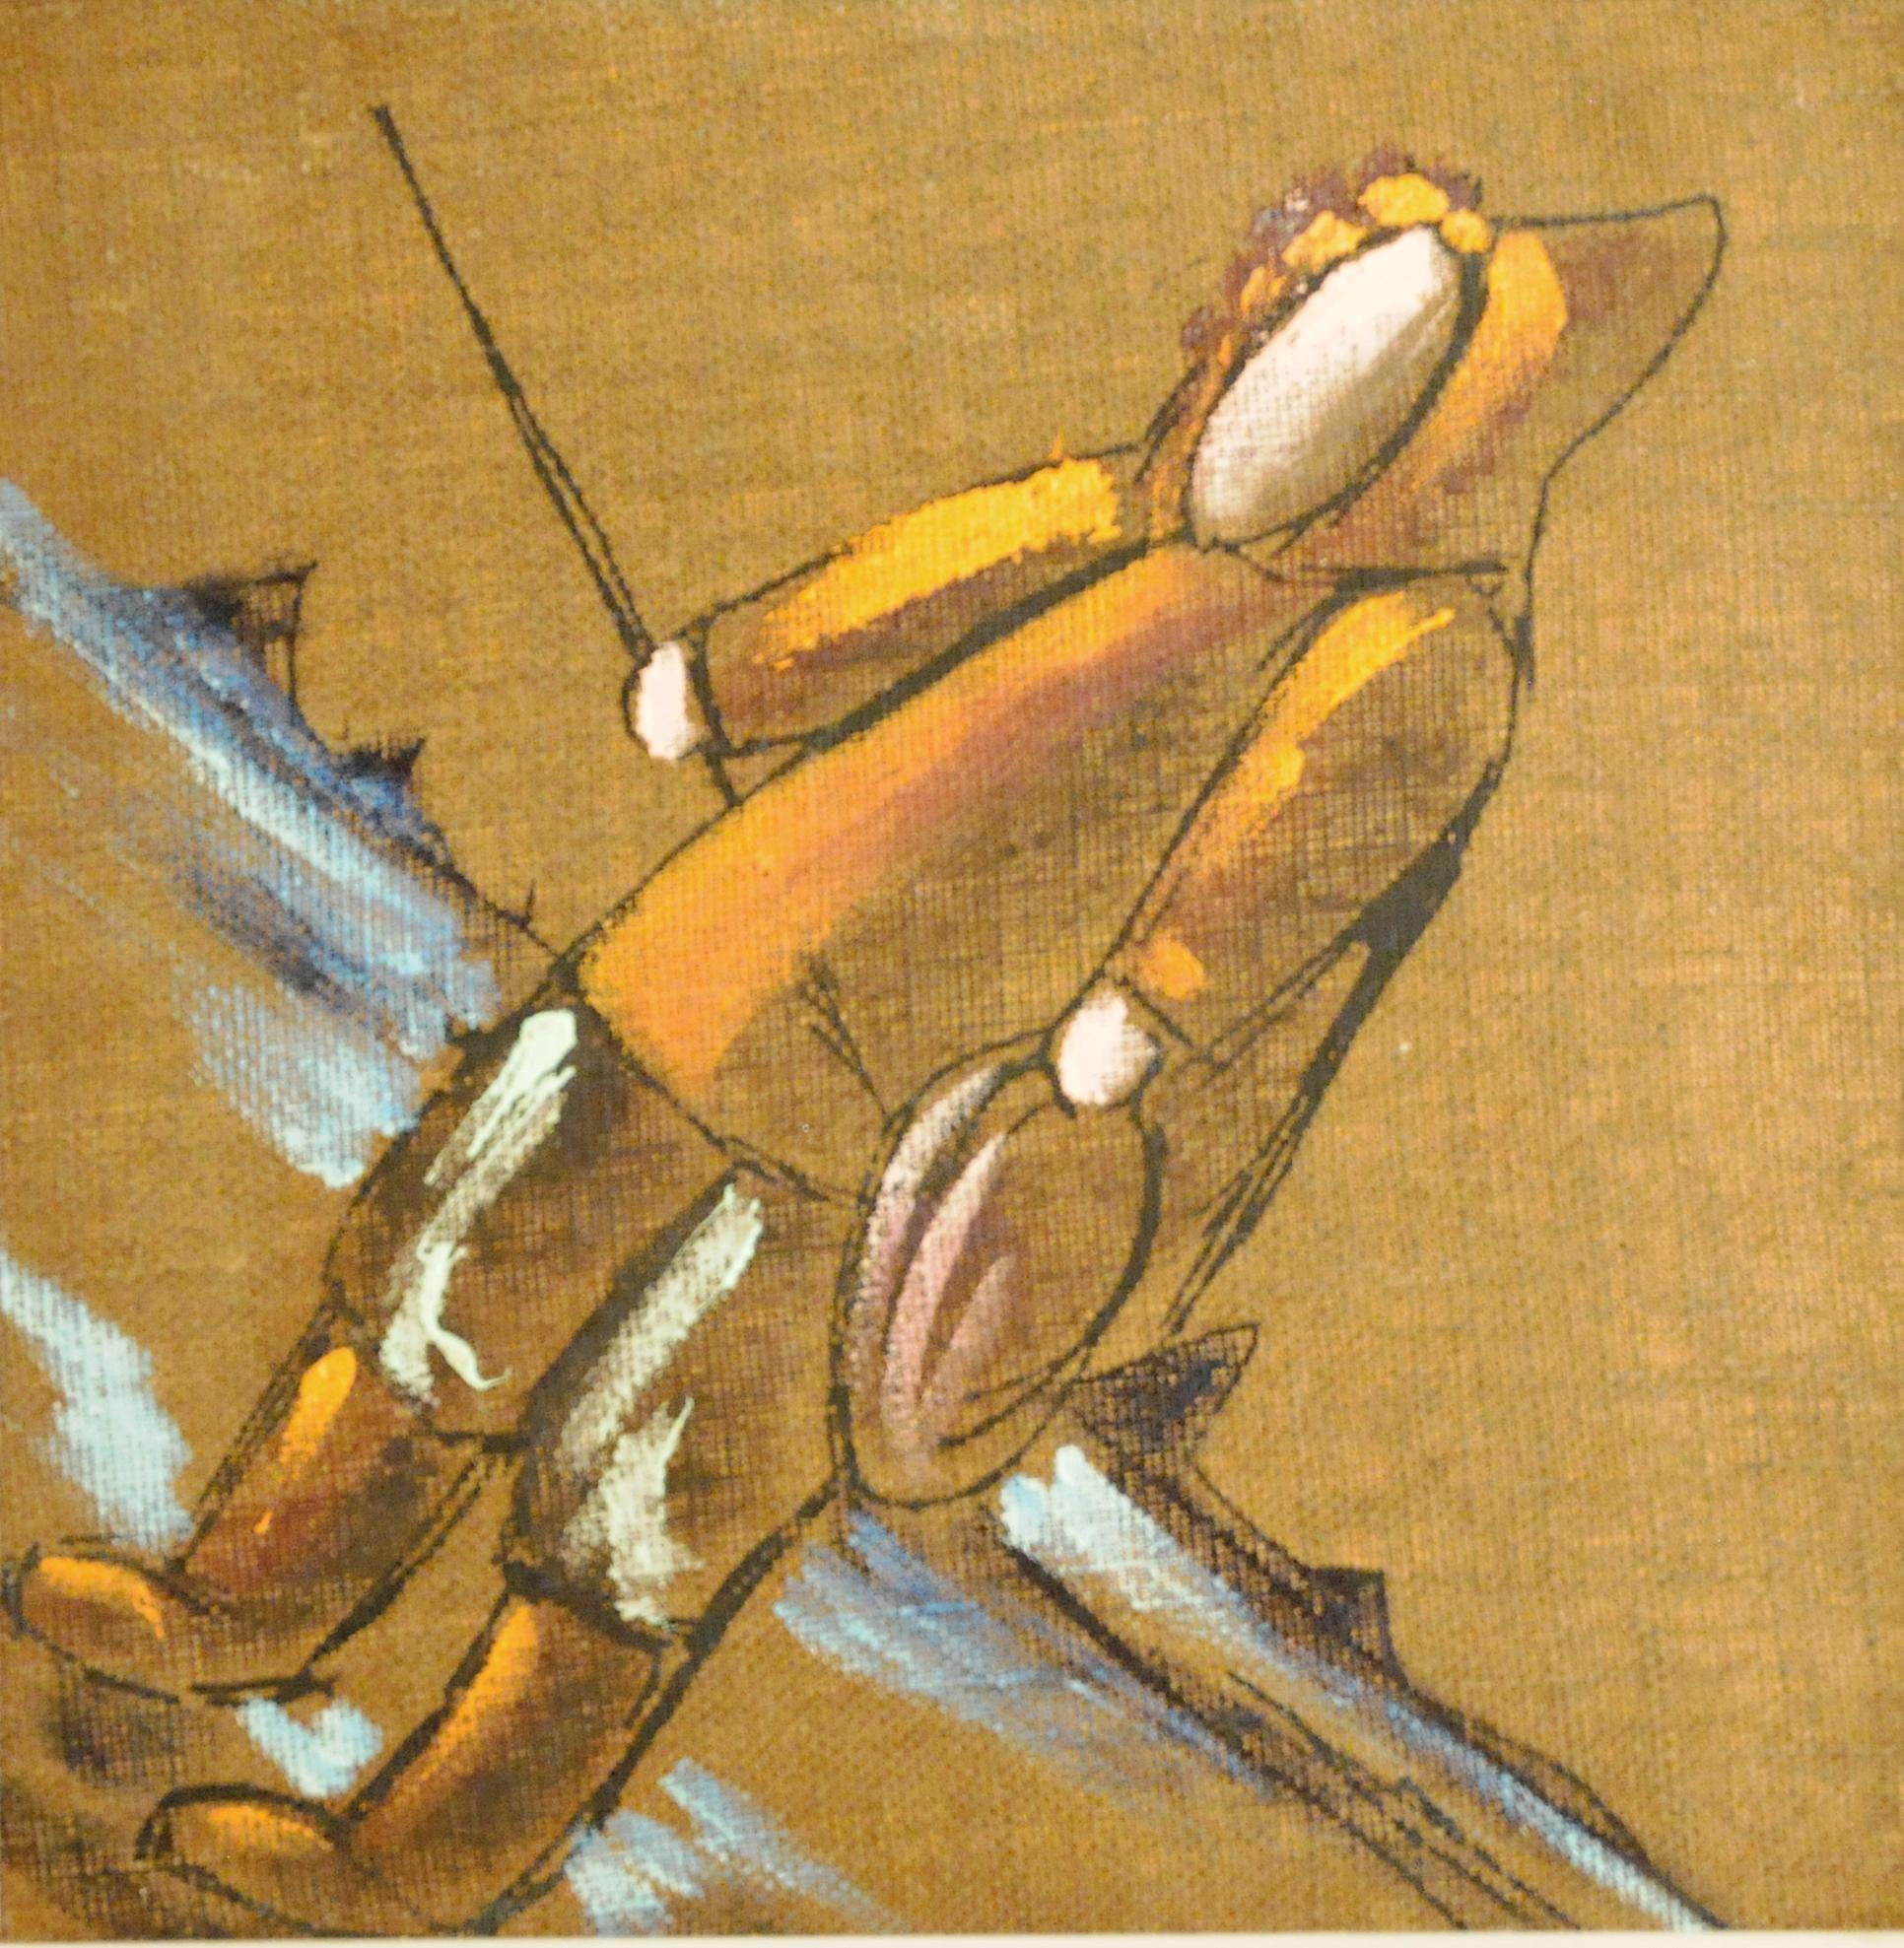 Untitled (Inuit Figure), c. 1960s, Levente Kovàcs, acrylic on canvas